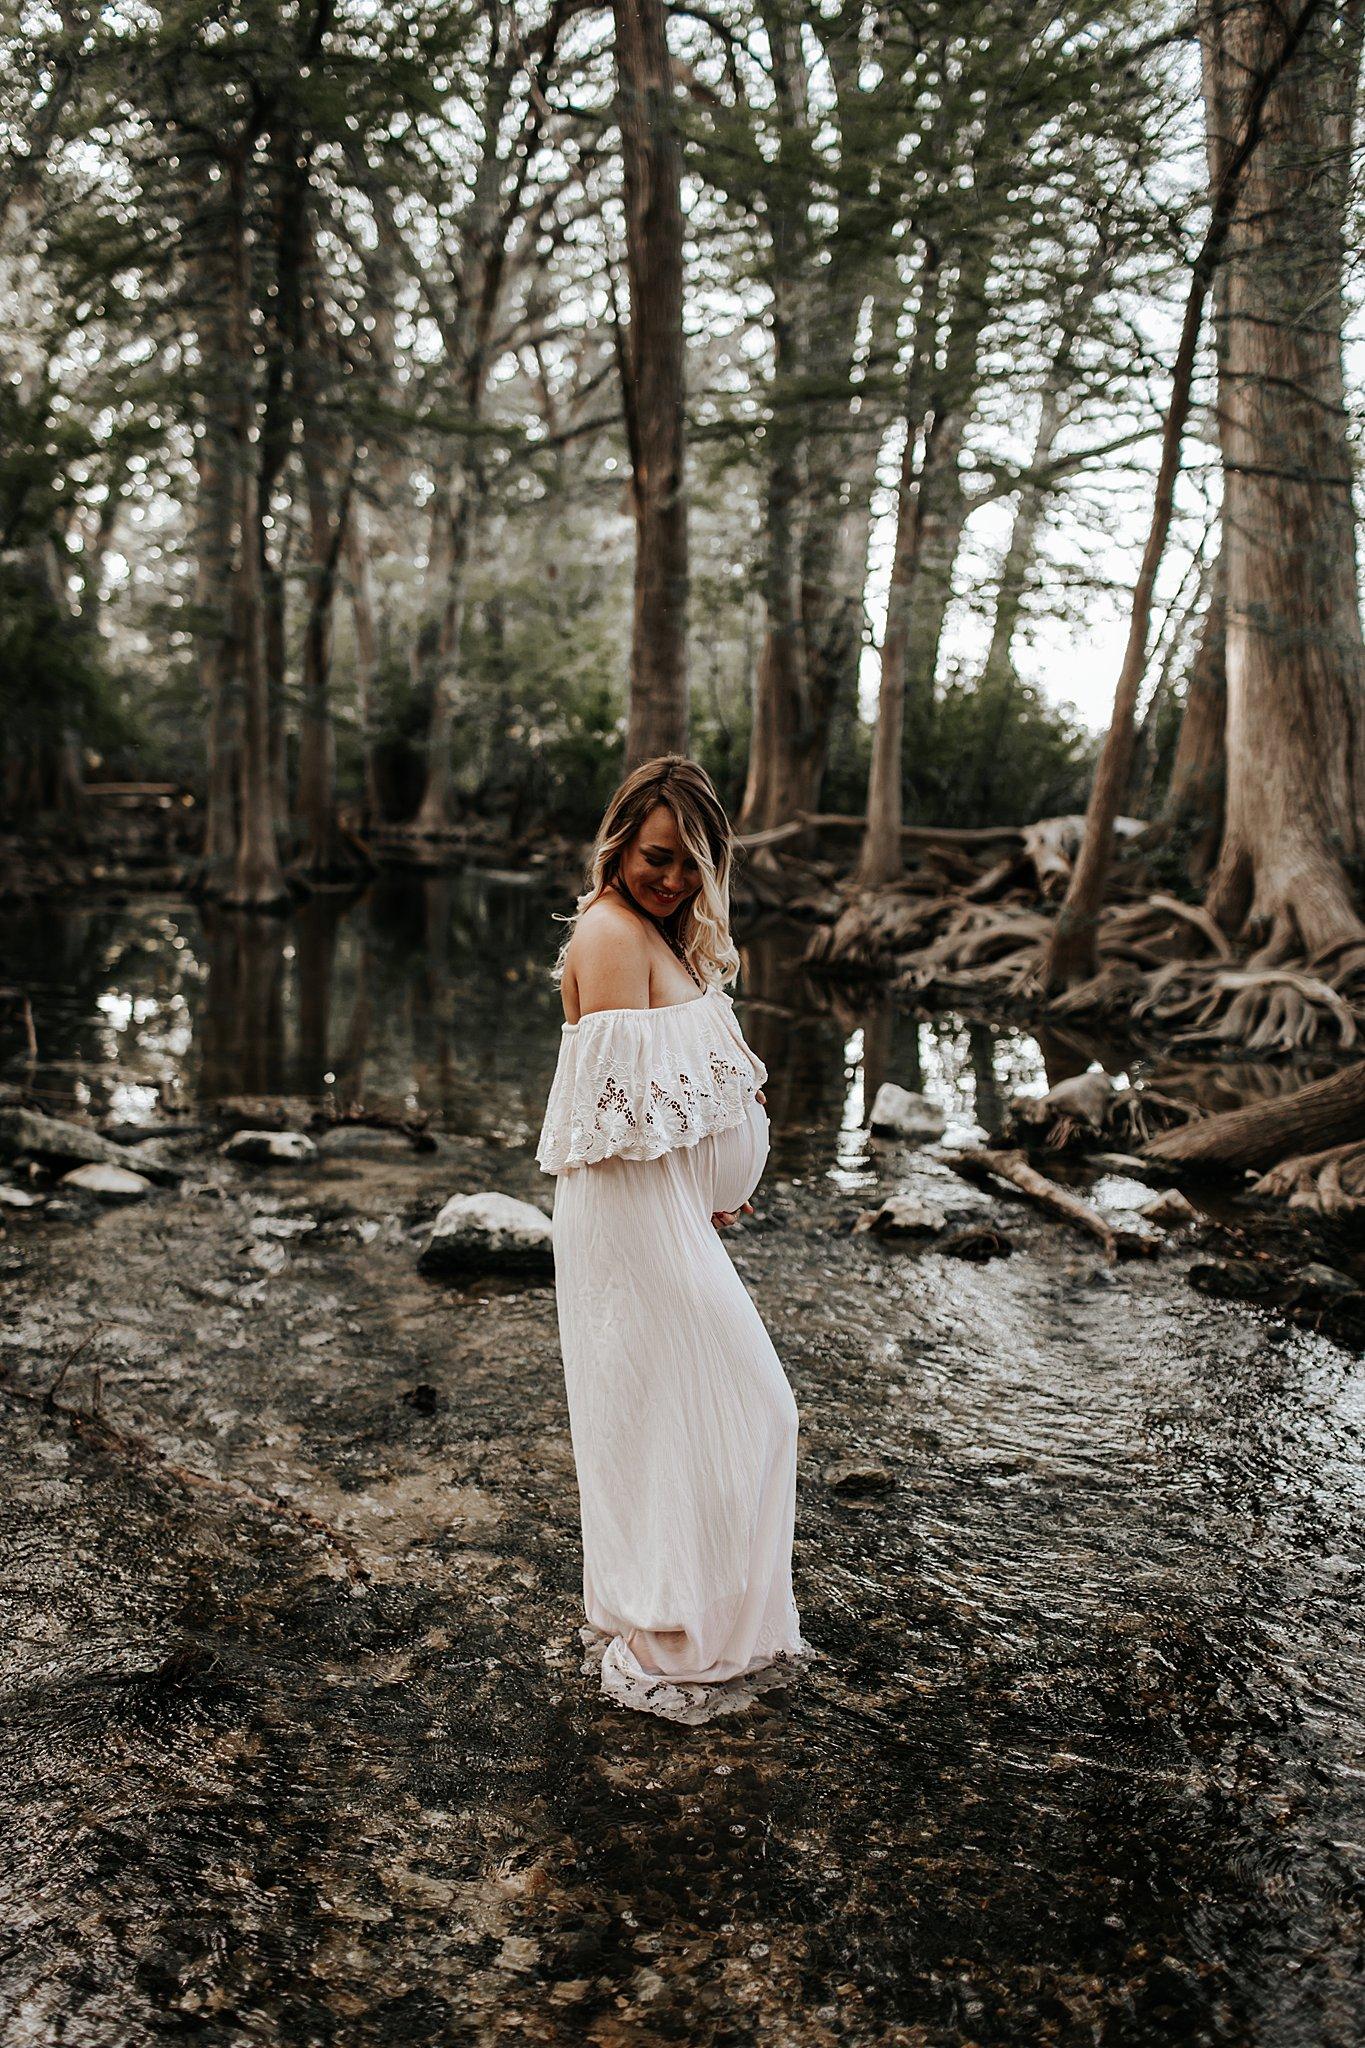 Shannon-San-Antonio-Maternity-Photographer-40_WEB.jpg